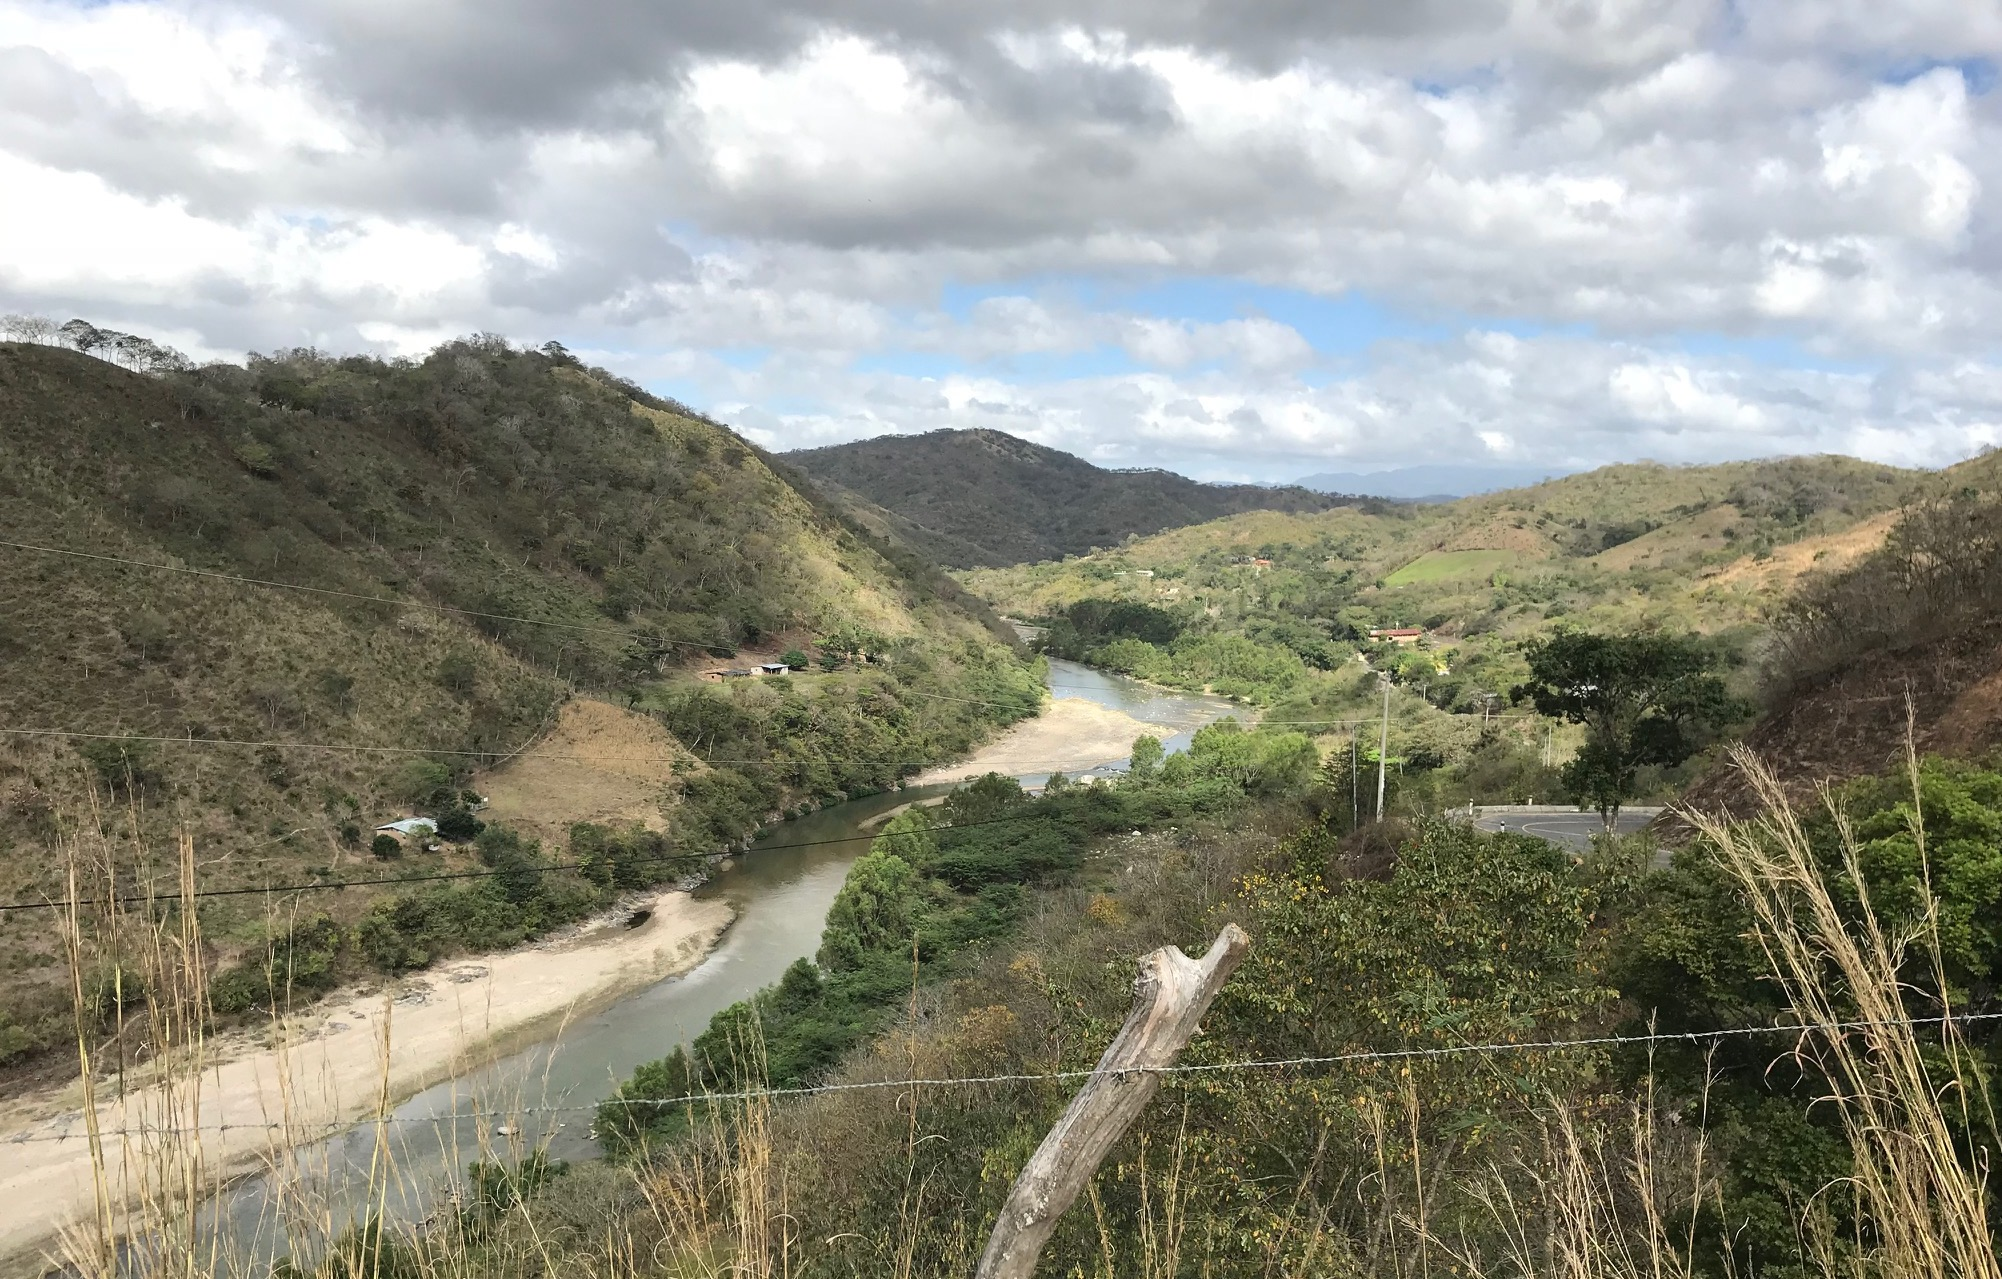 The Nicaragua Trip